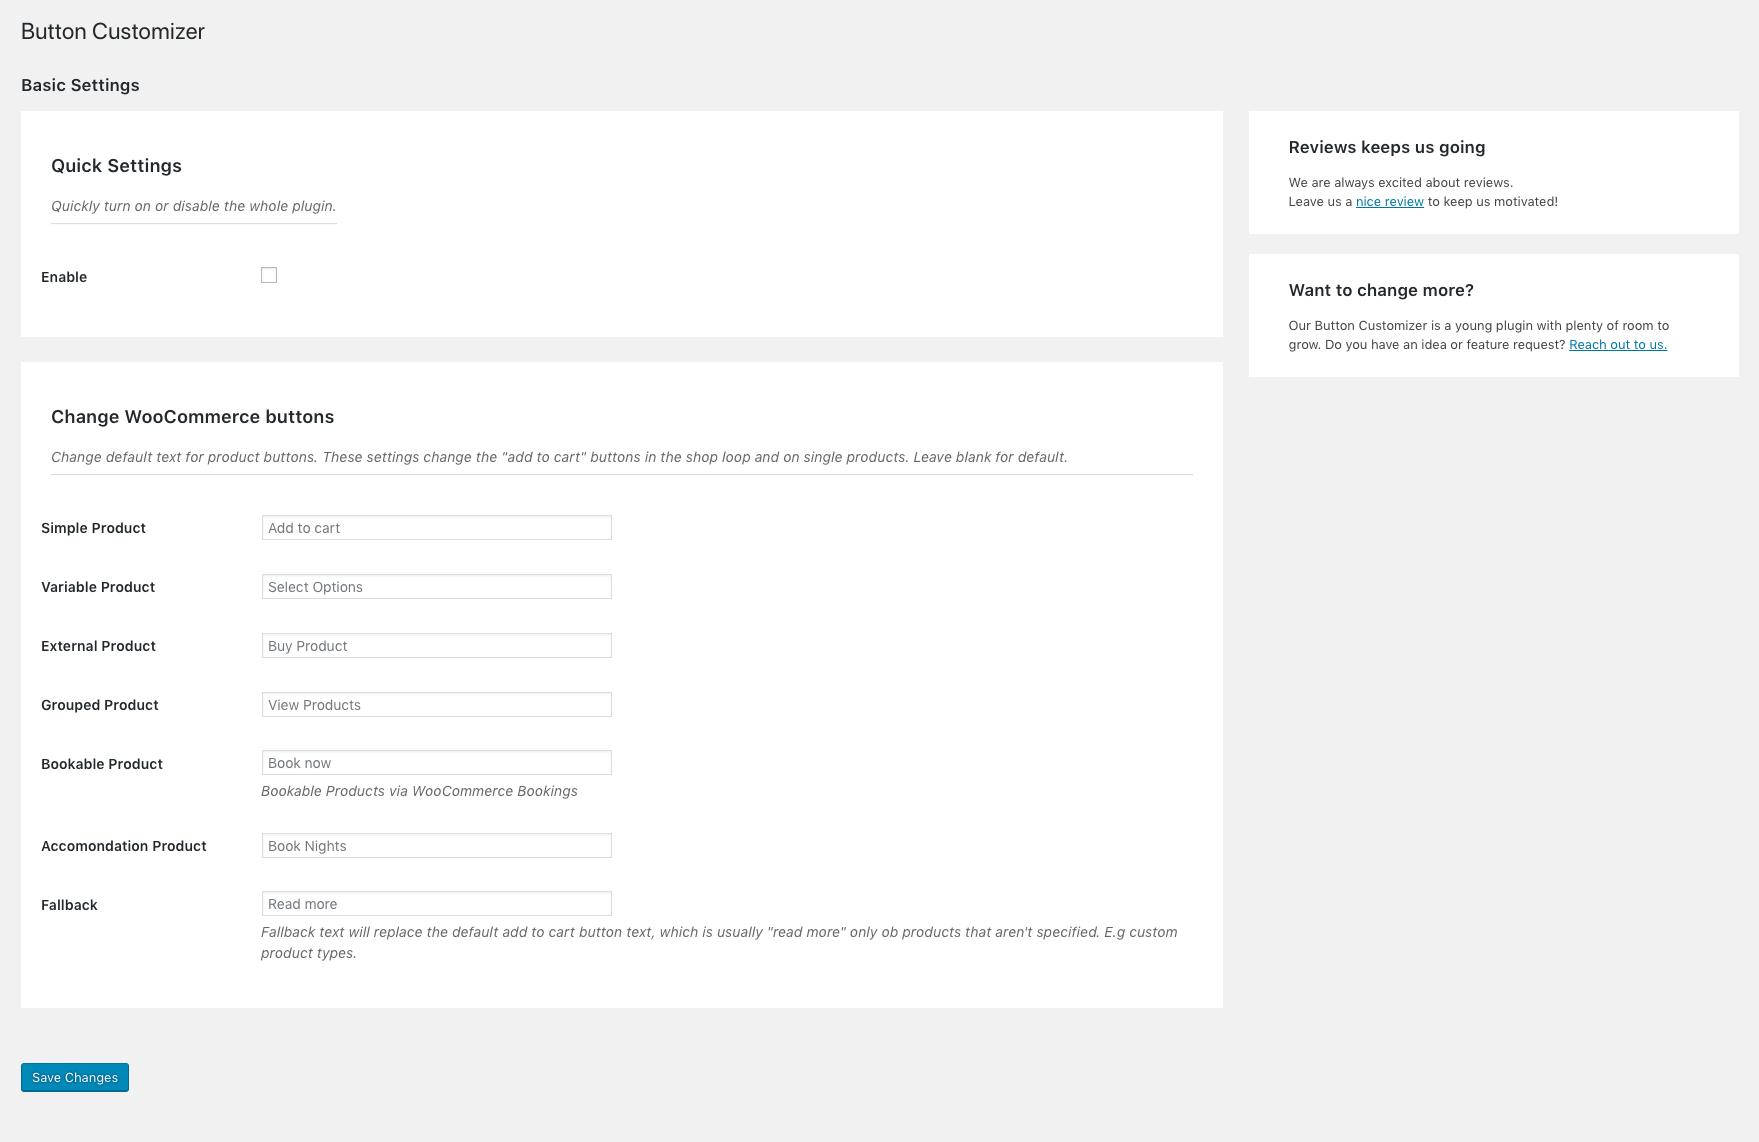 Button Customizer settings screen.